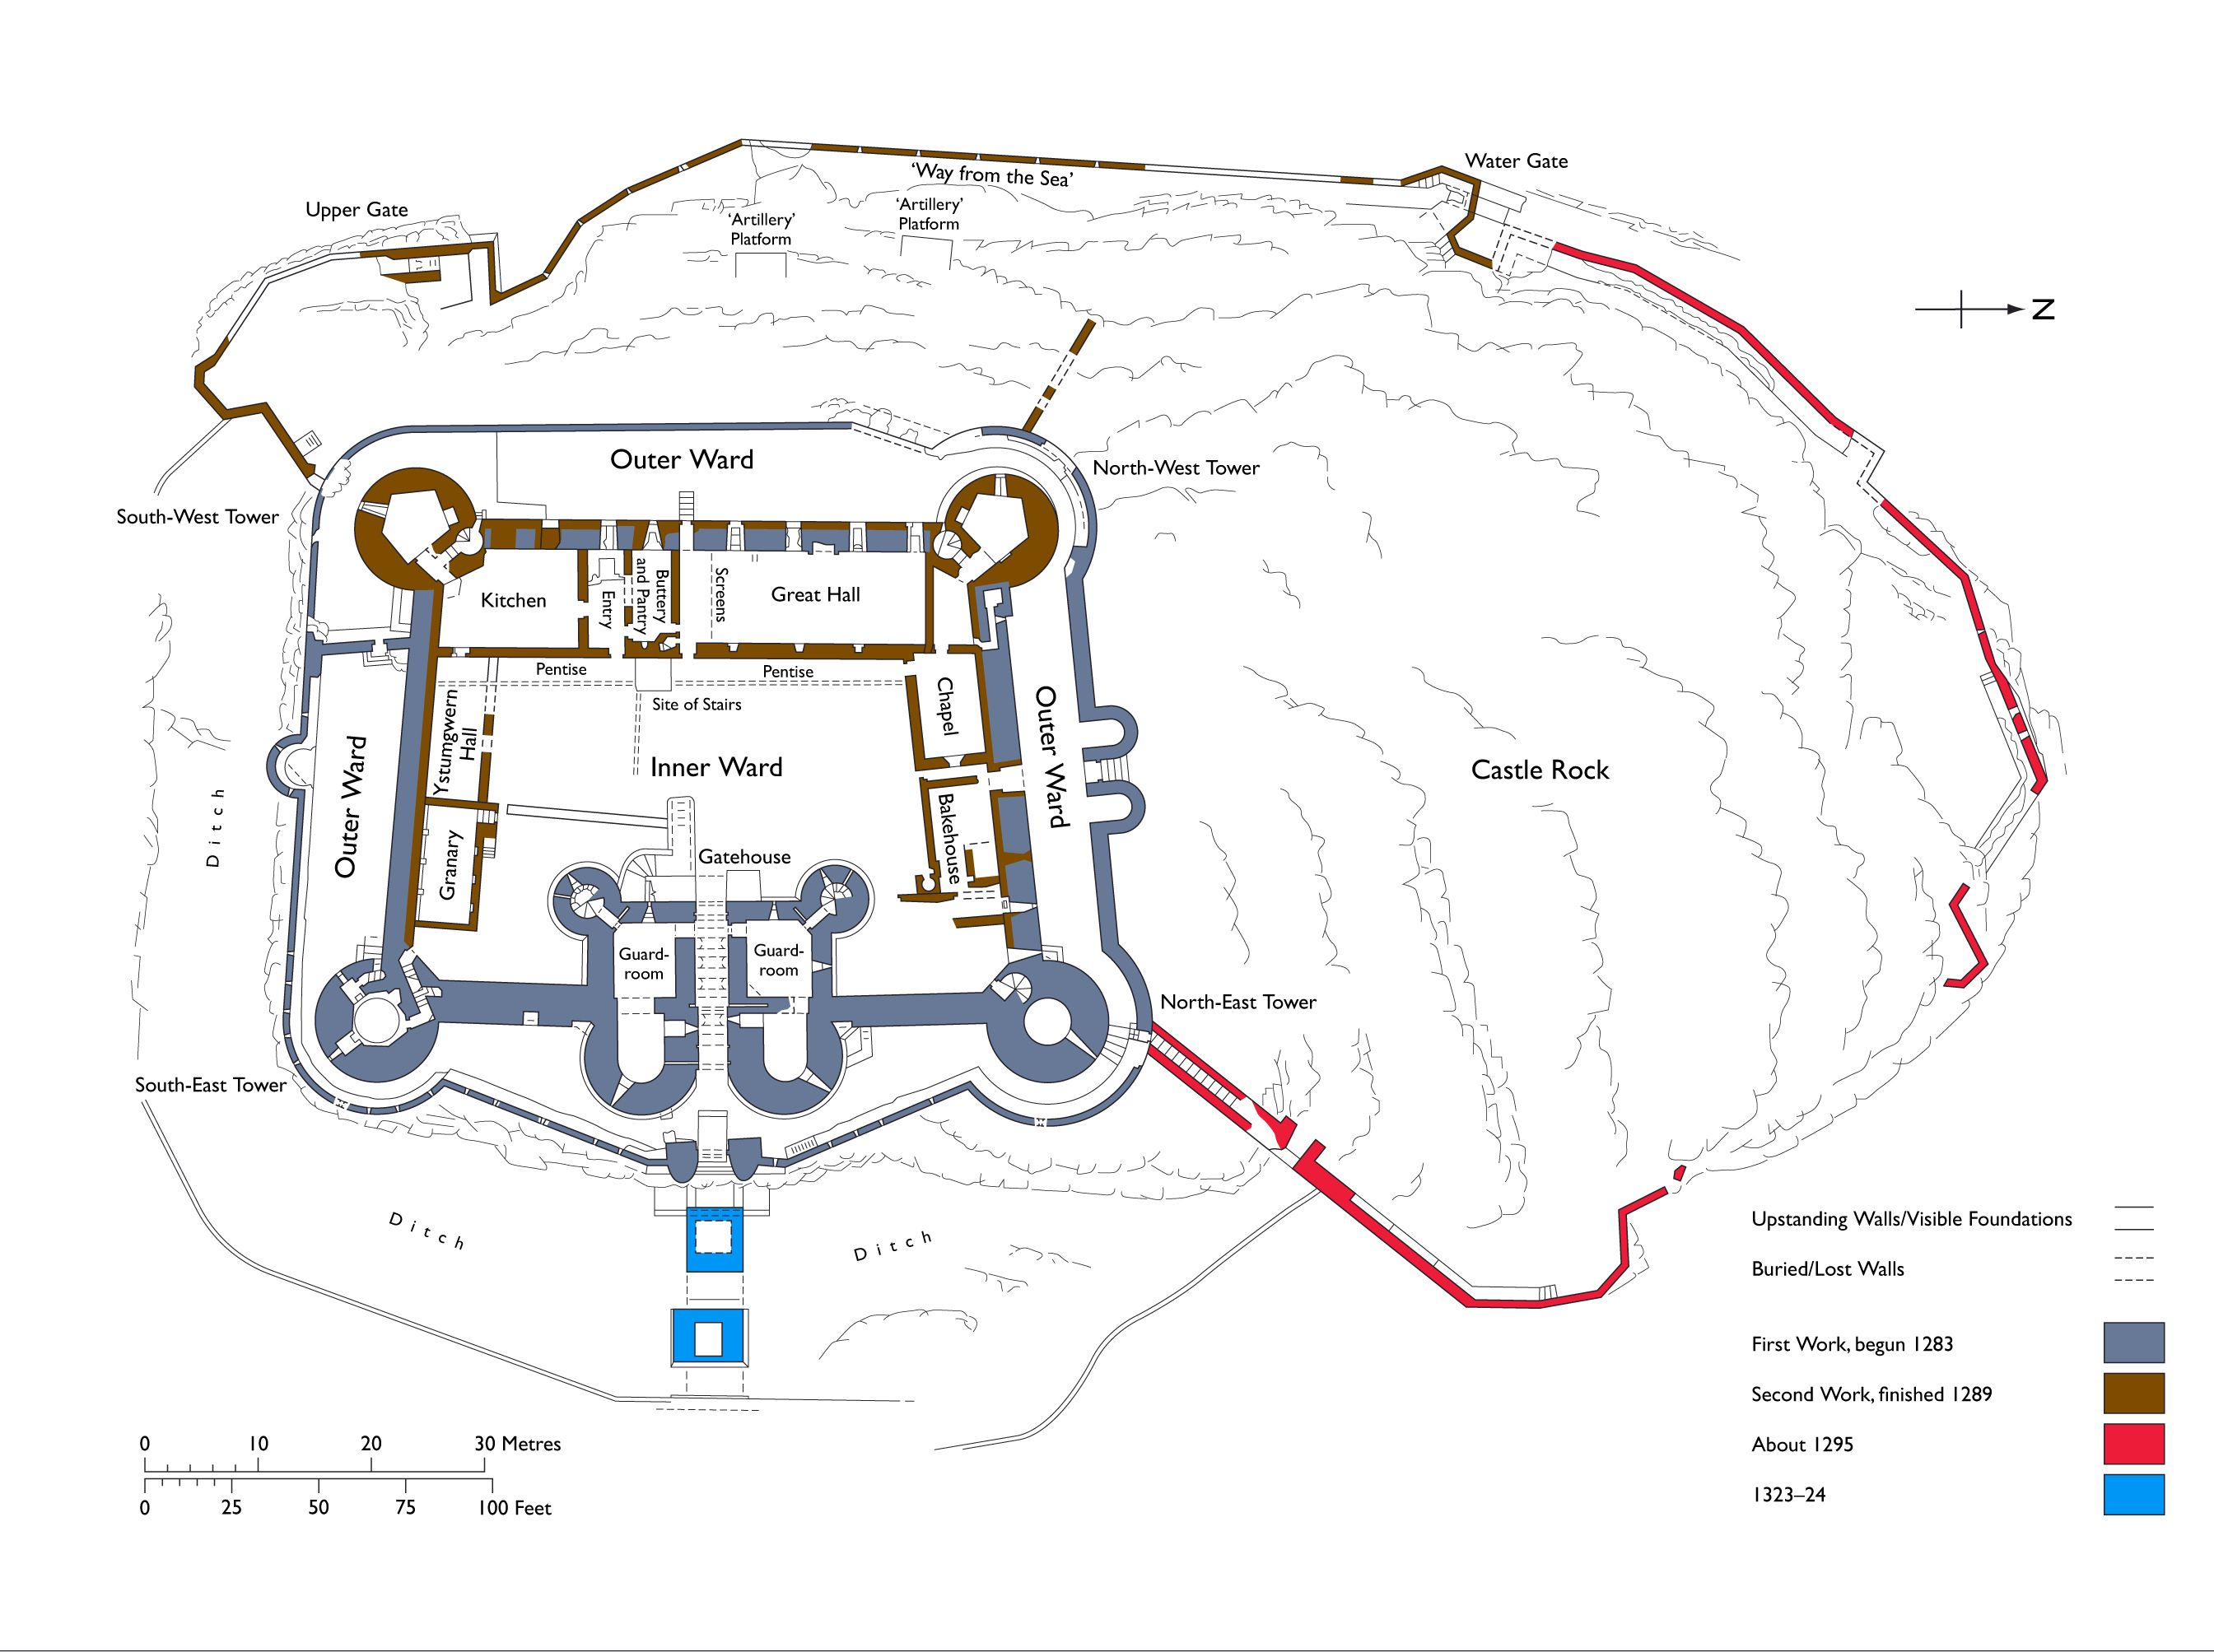 106-GOTHIC, Secular buildings, England - Site plan, Harlech Castle ...